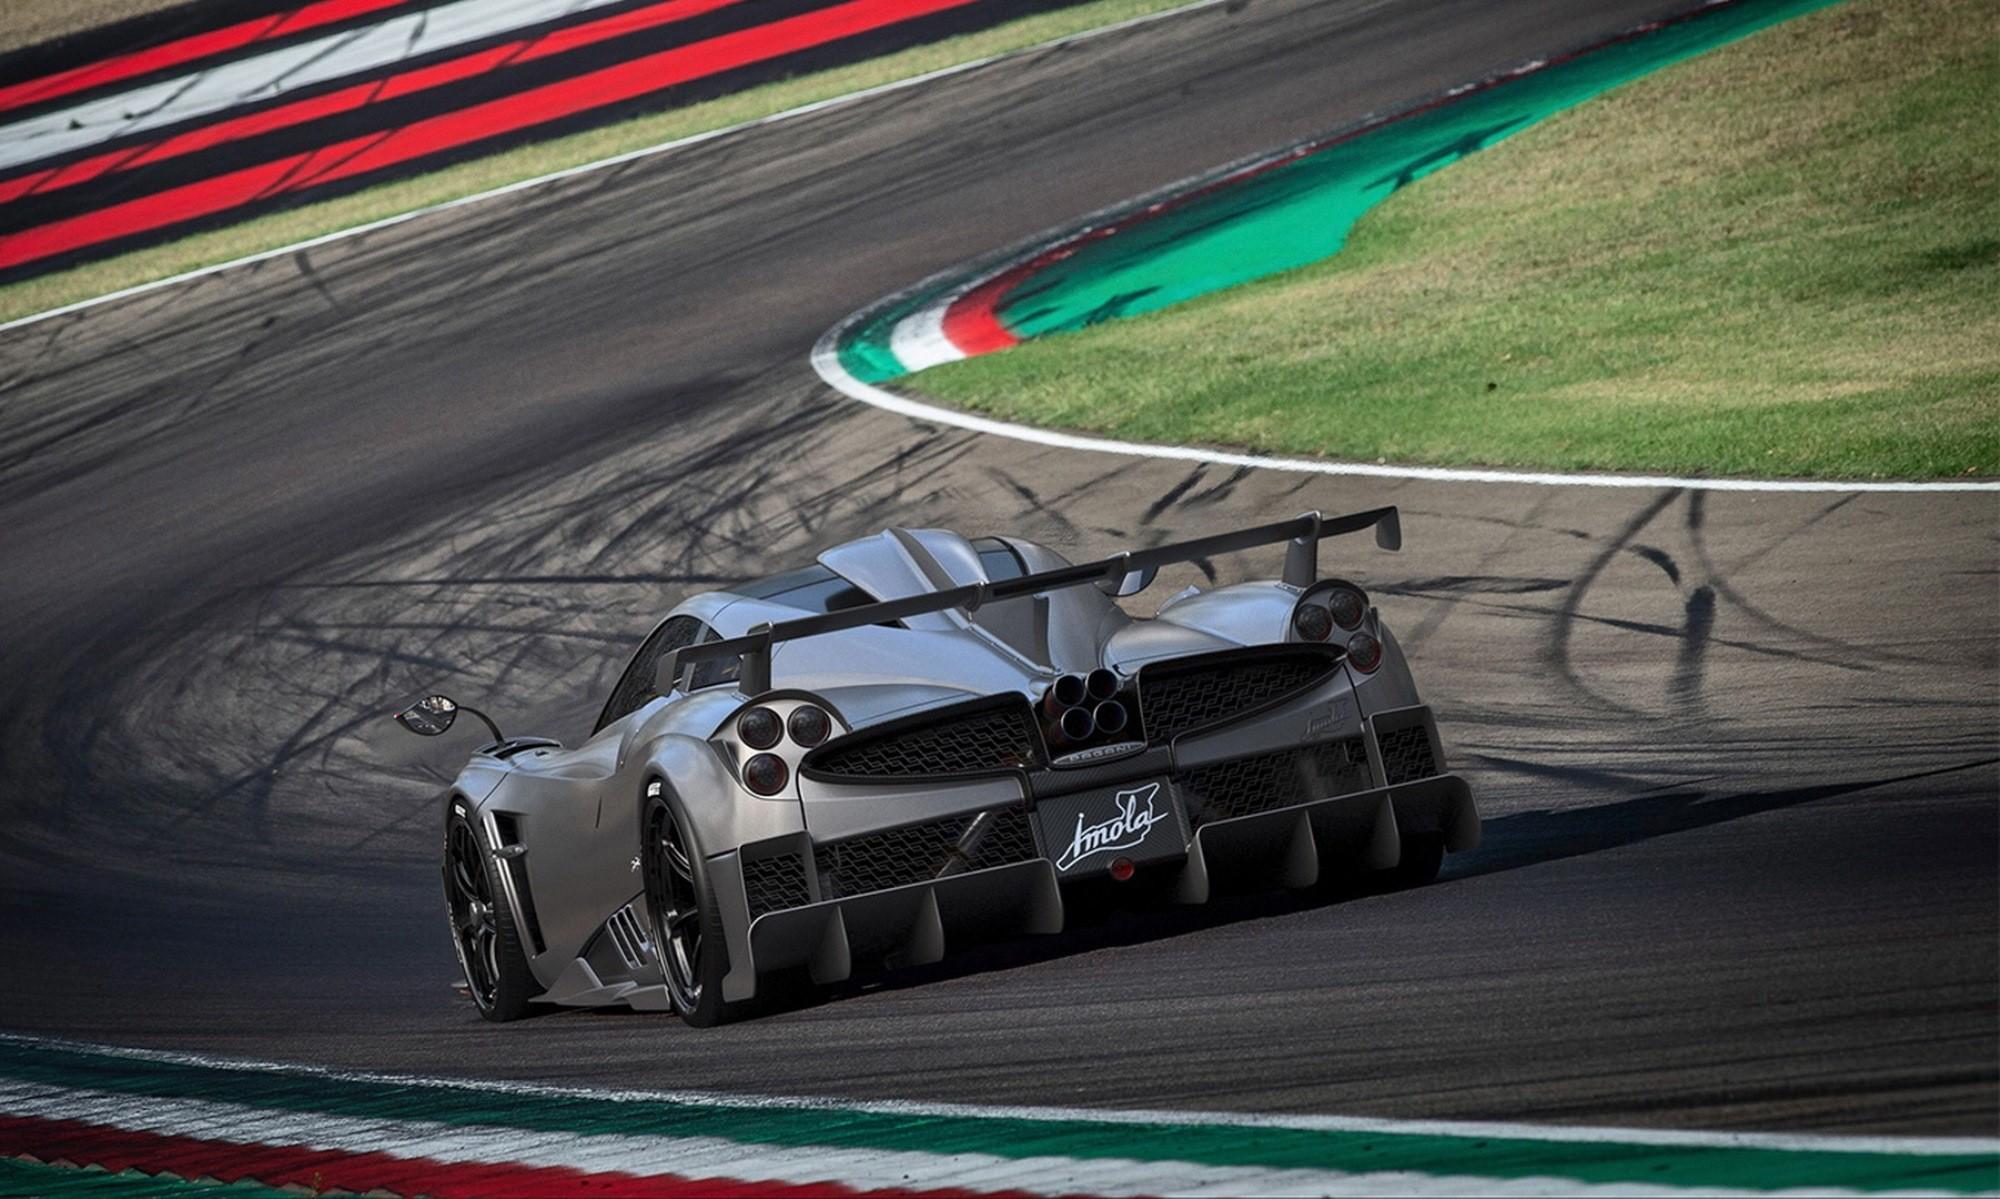 Pagani Imola rear track